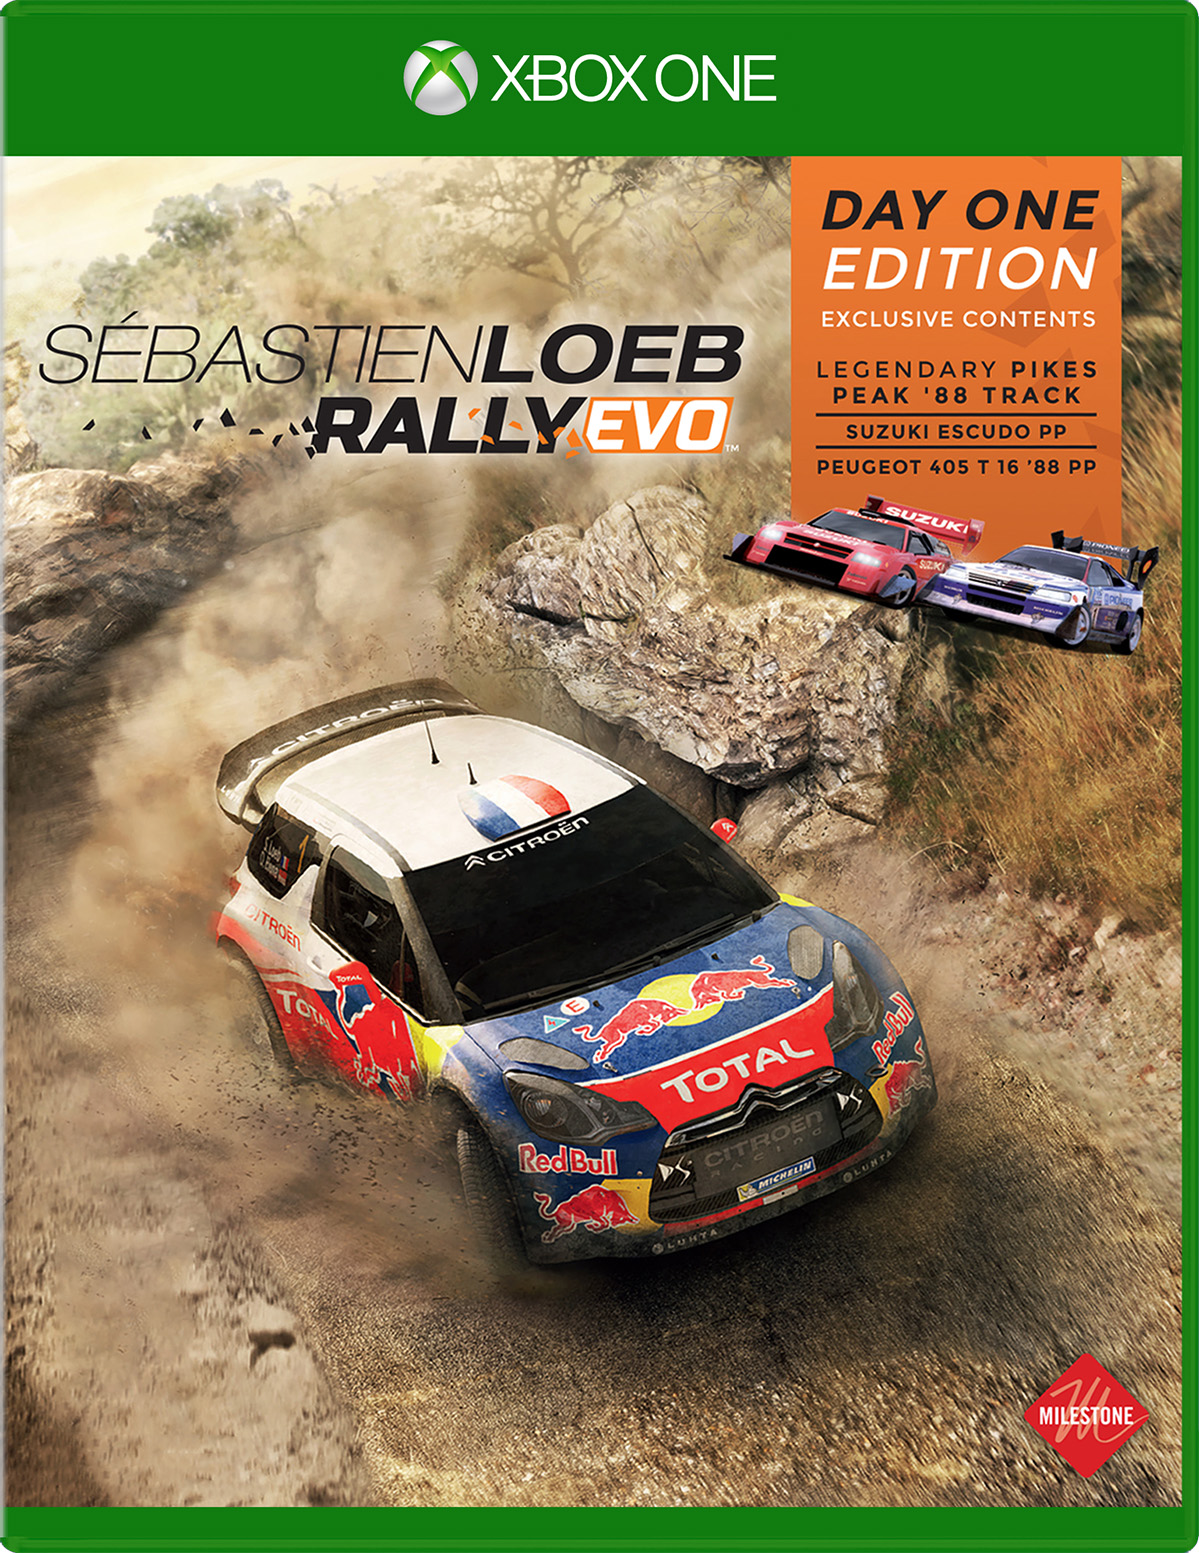 Sebastien Loeb Rally Evo Day One Edition For Xbox One